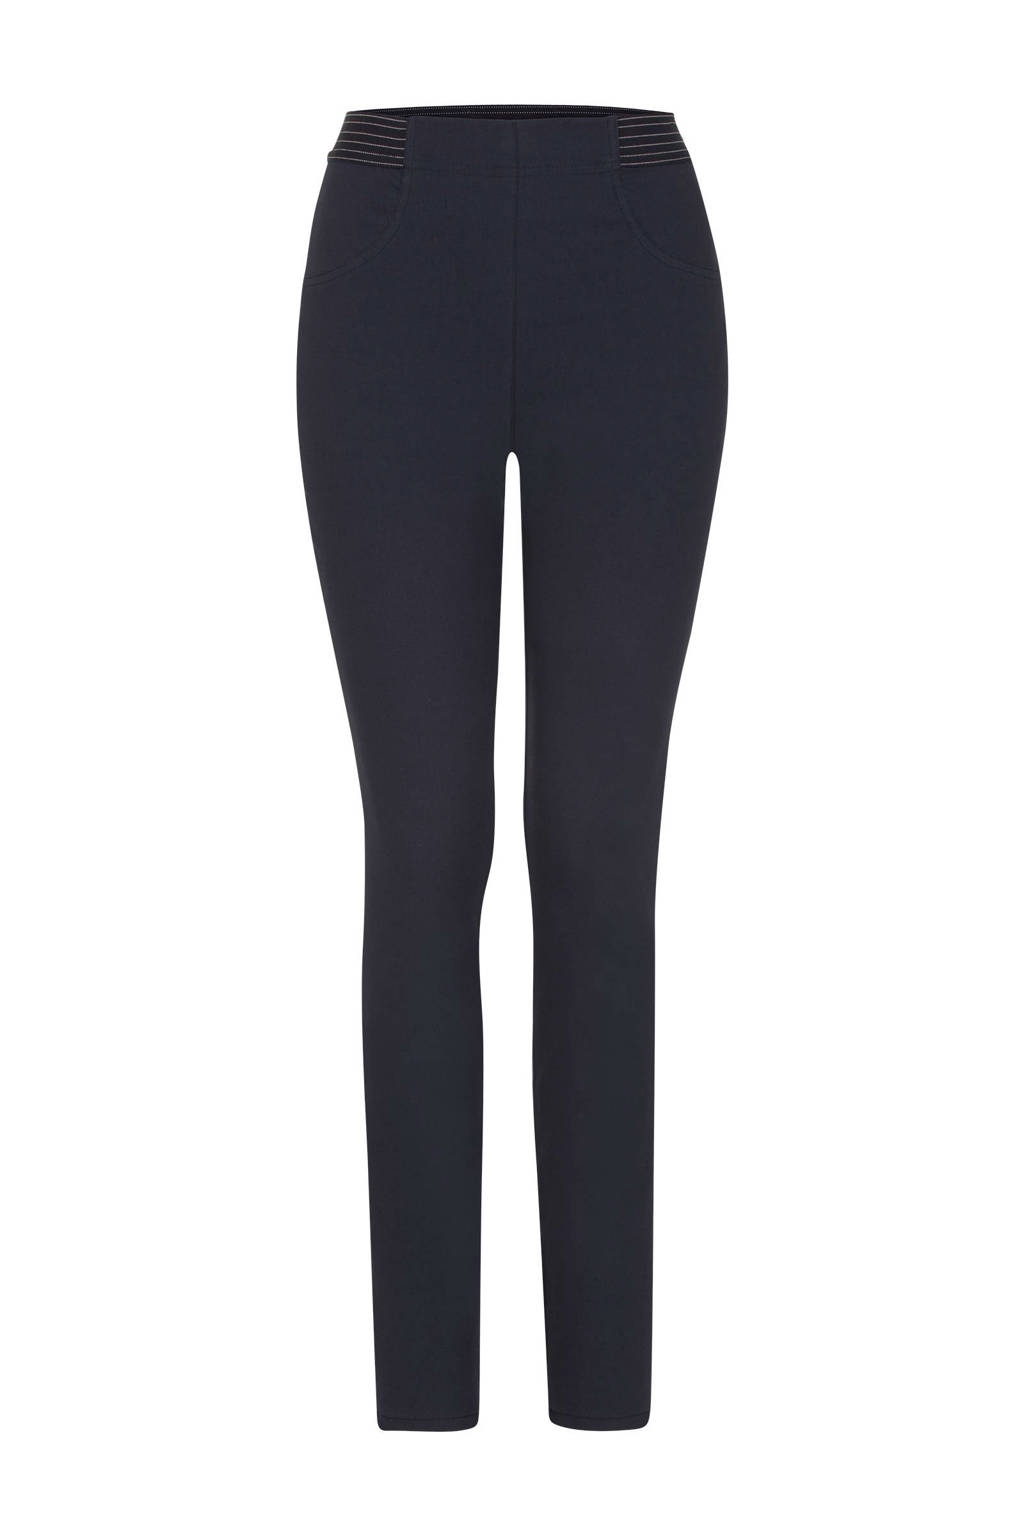 Miss Etam Regulier skinny pantalon blauw, Blauw